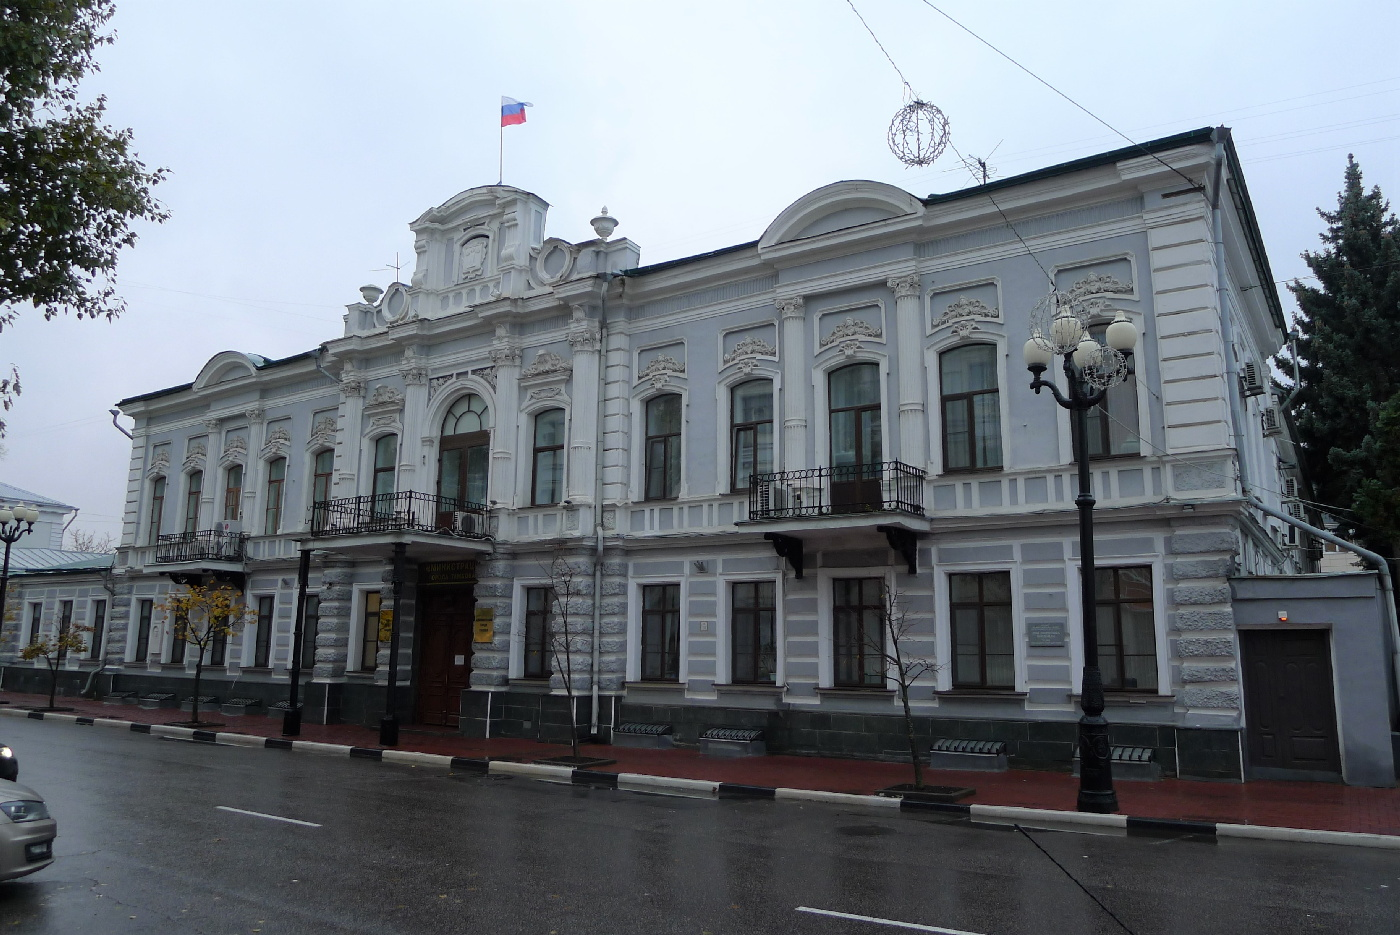 Русский Юг: Тамбов (Усадьба Асеевых, город) P1100378